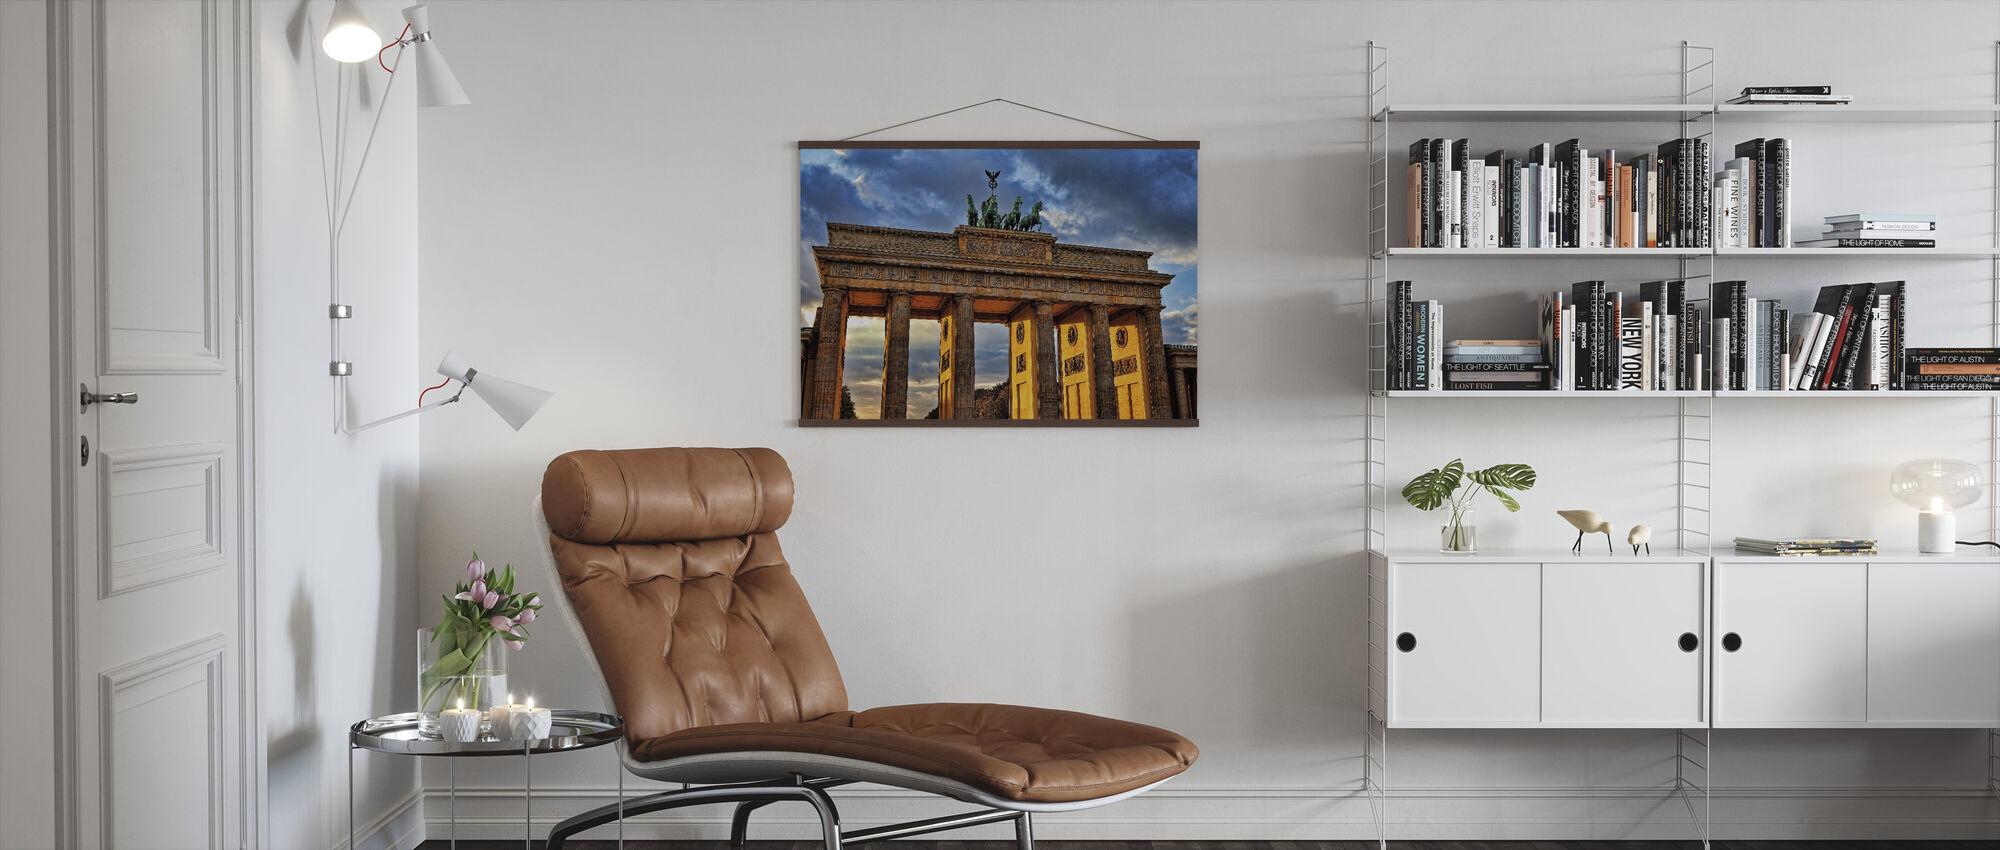 Sunset in Berlin - Poster - Living Room